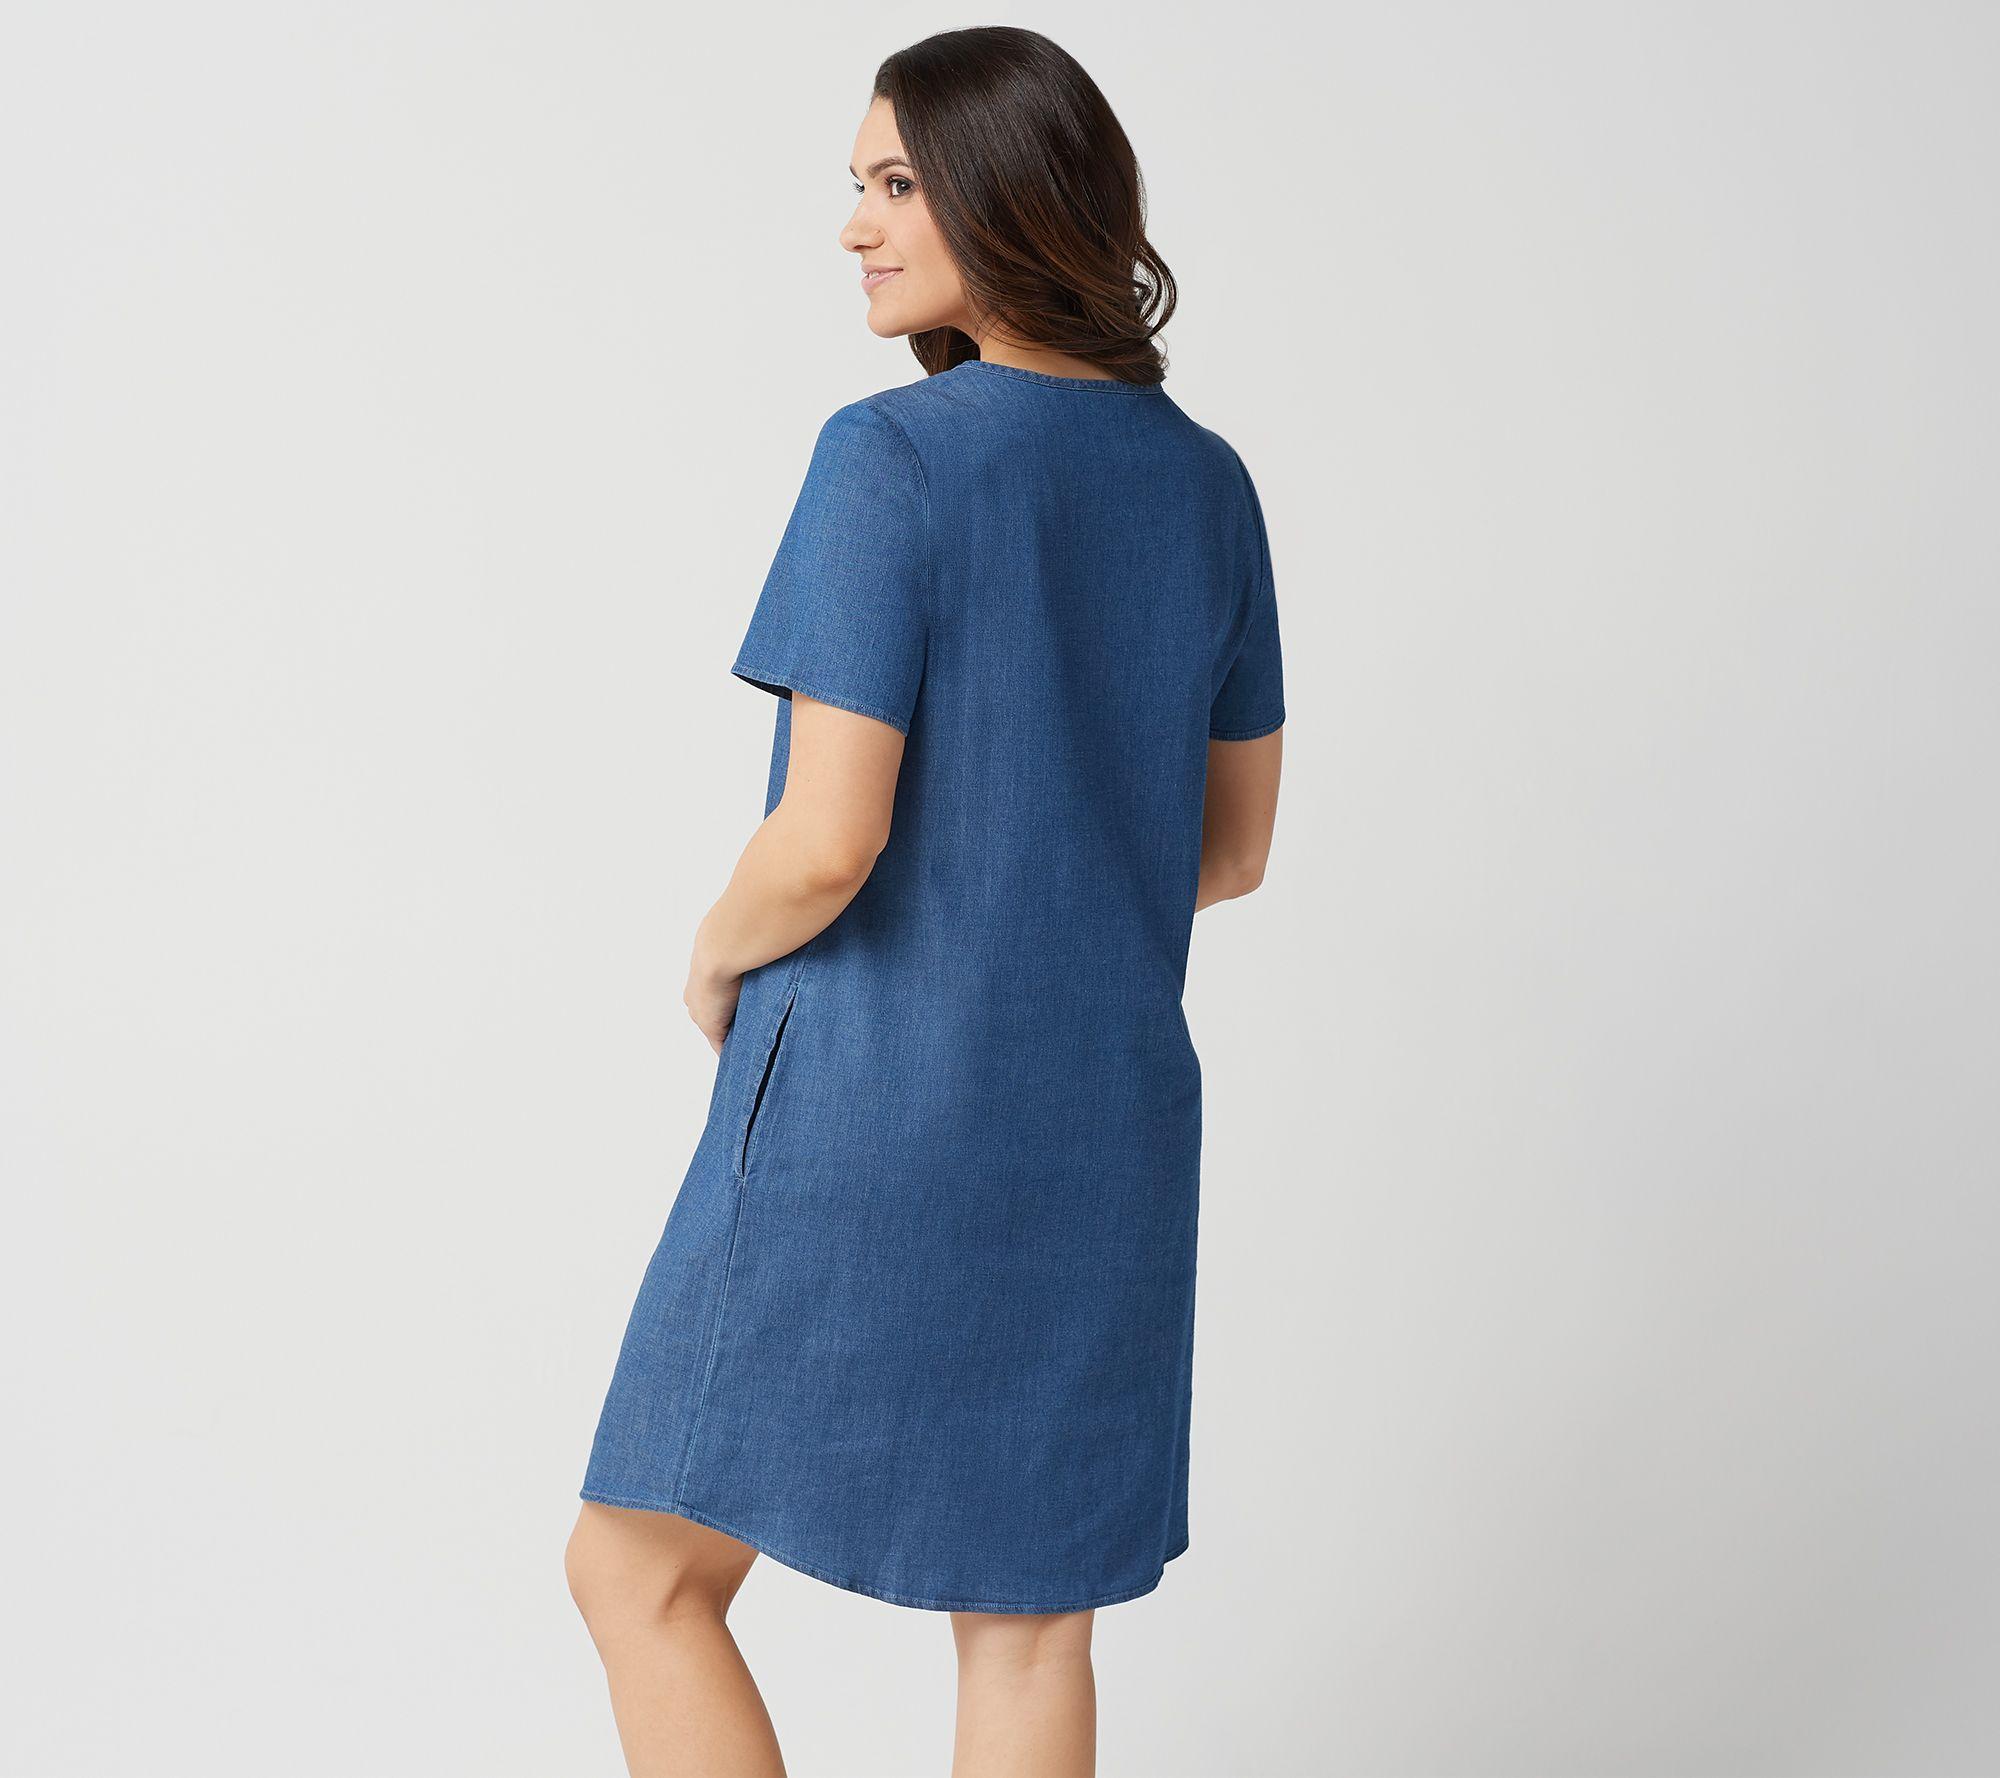 2e0eaf3333 Denim   Co. Embroidered Stretch Chambray Split V-Neck Dress - Page 1 —  QVC.com